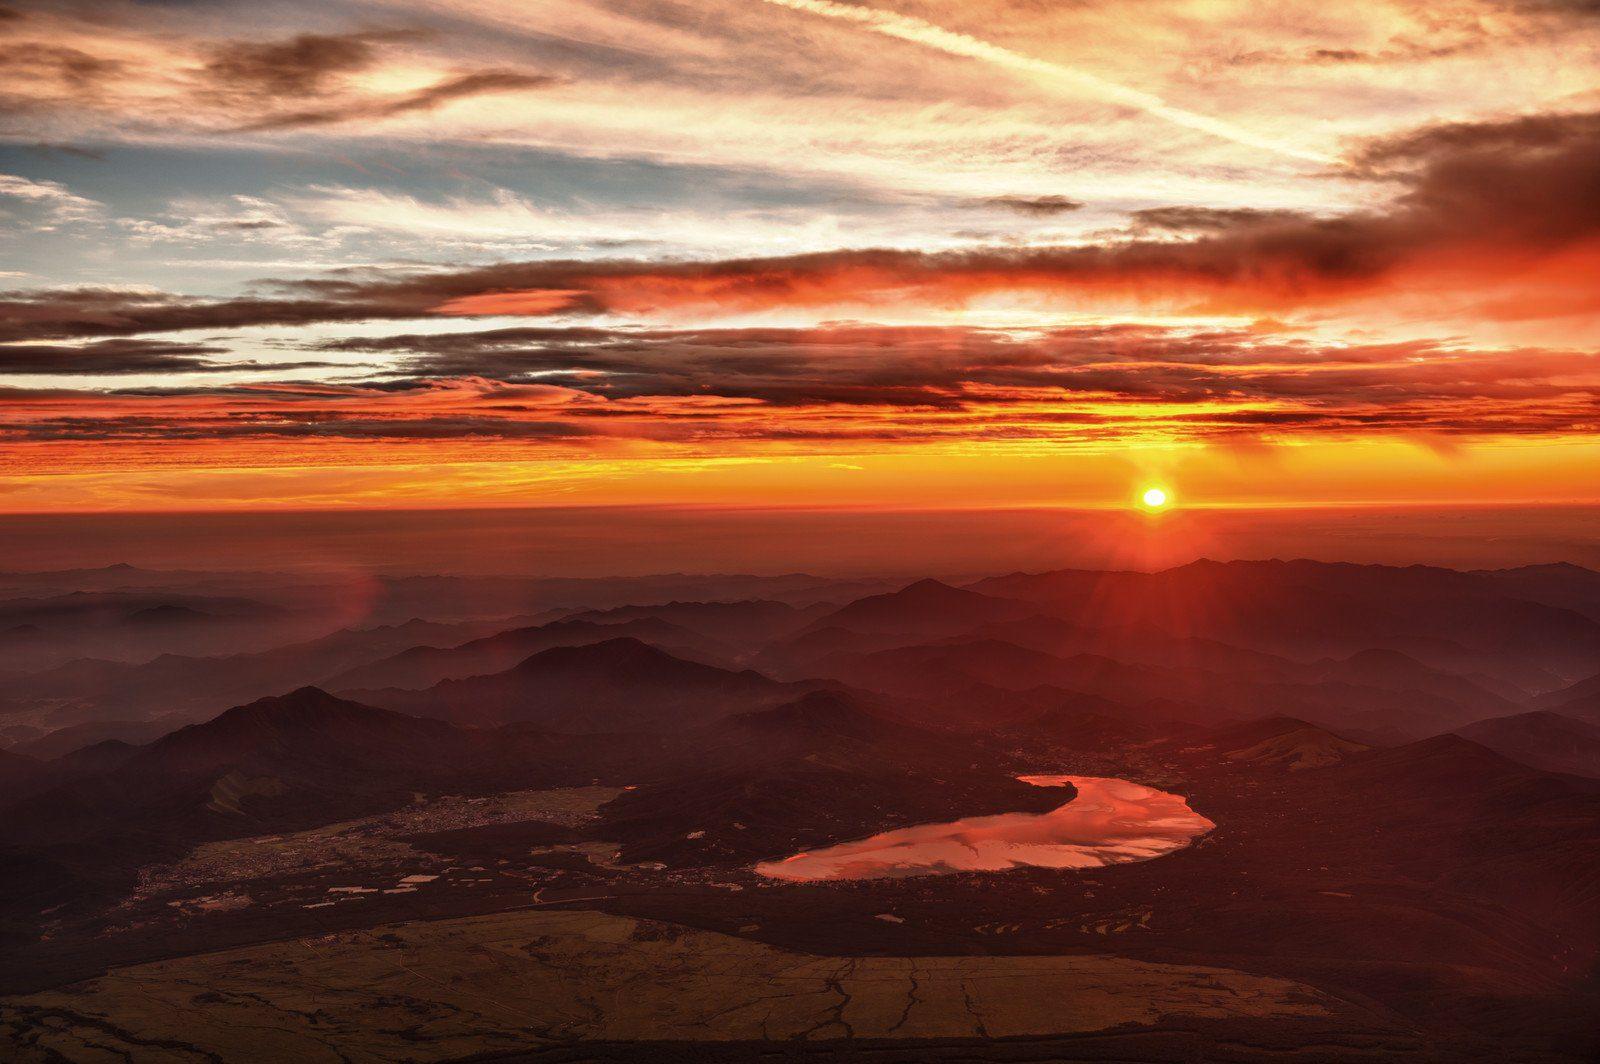 Sunrise View of Lake Kawaguchiko from the Summit of Mt Fuji